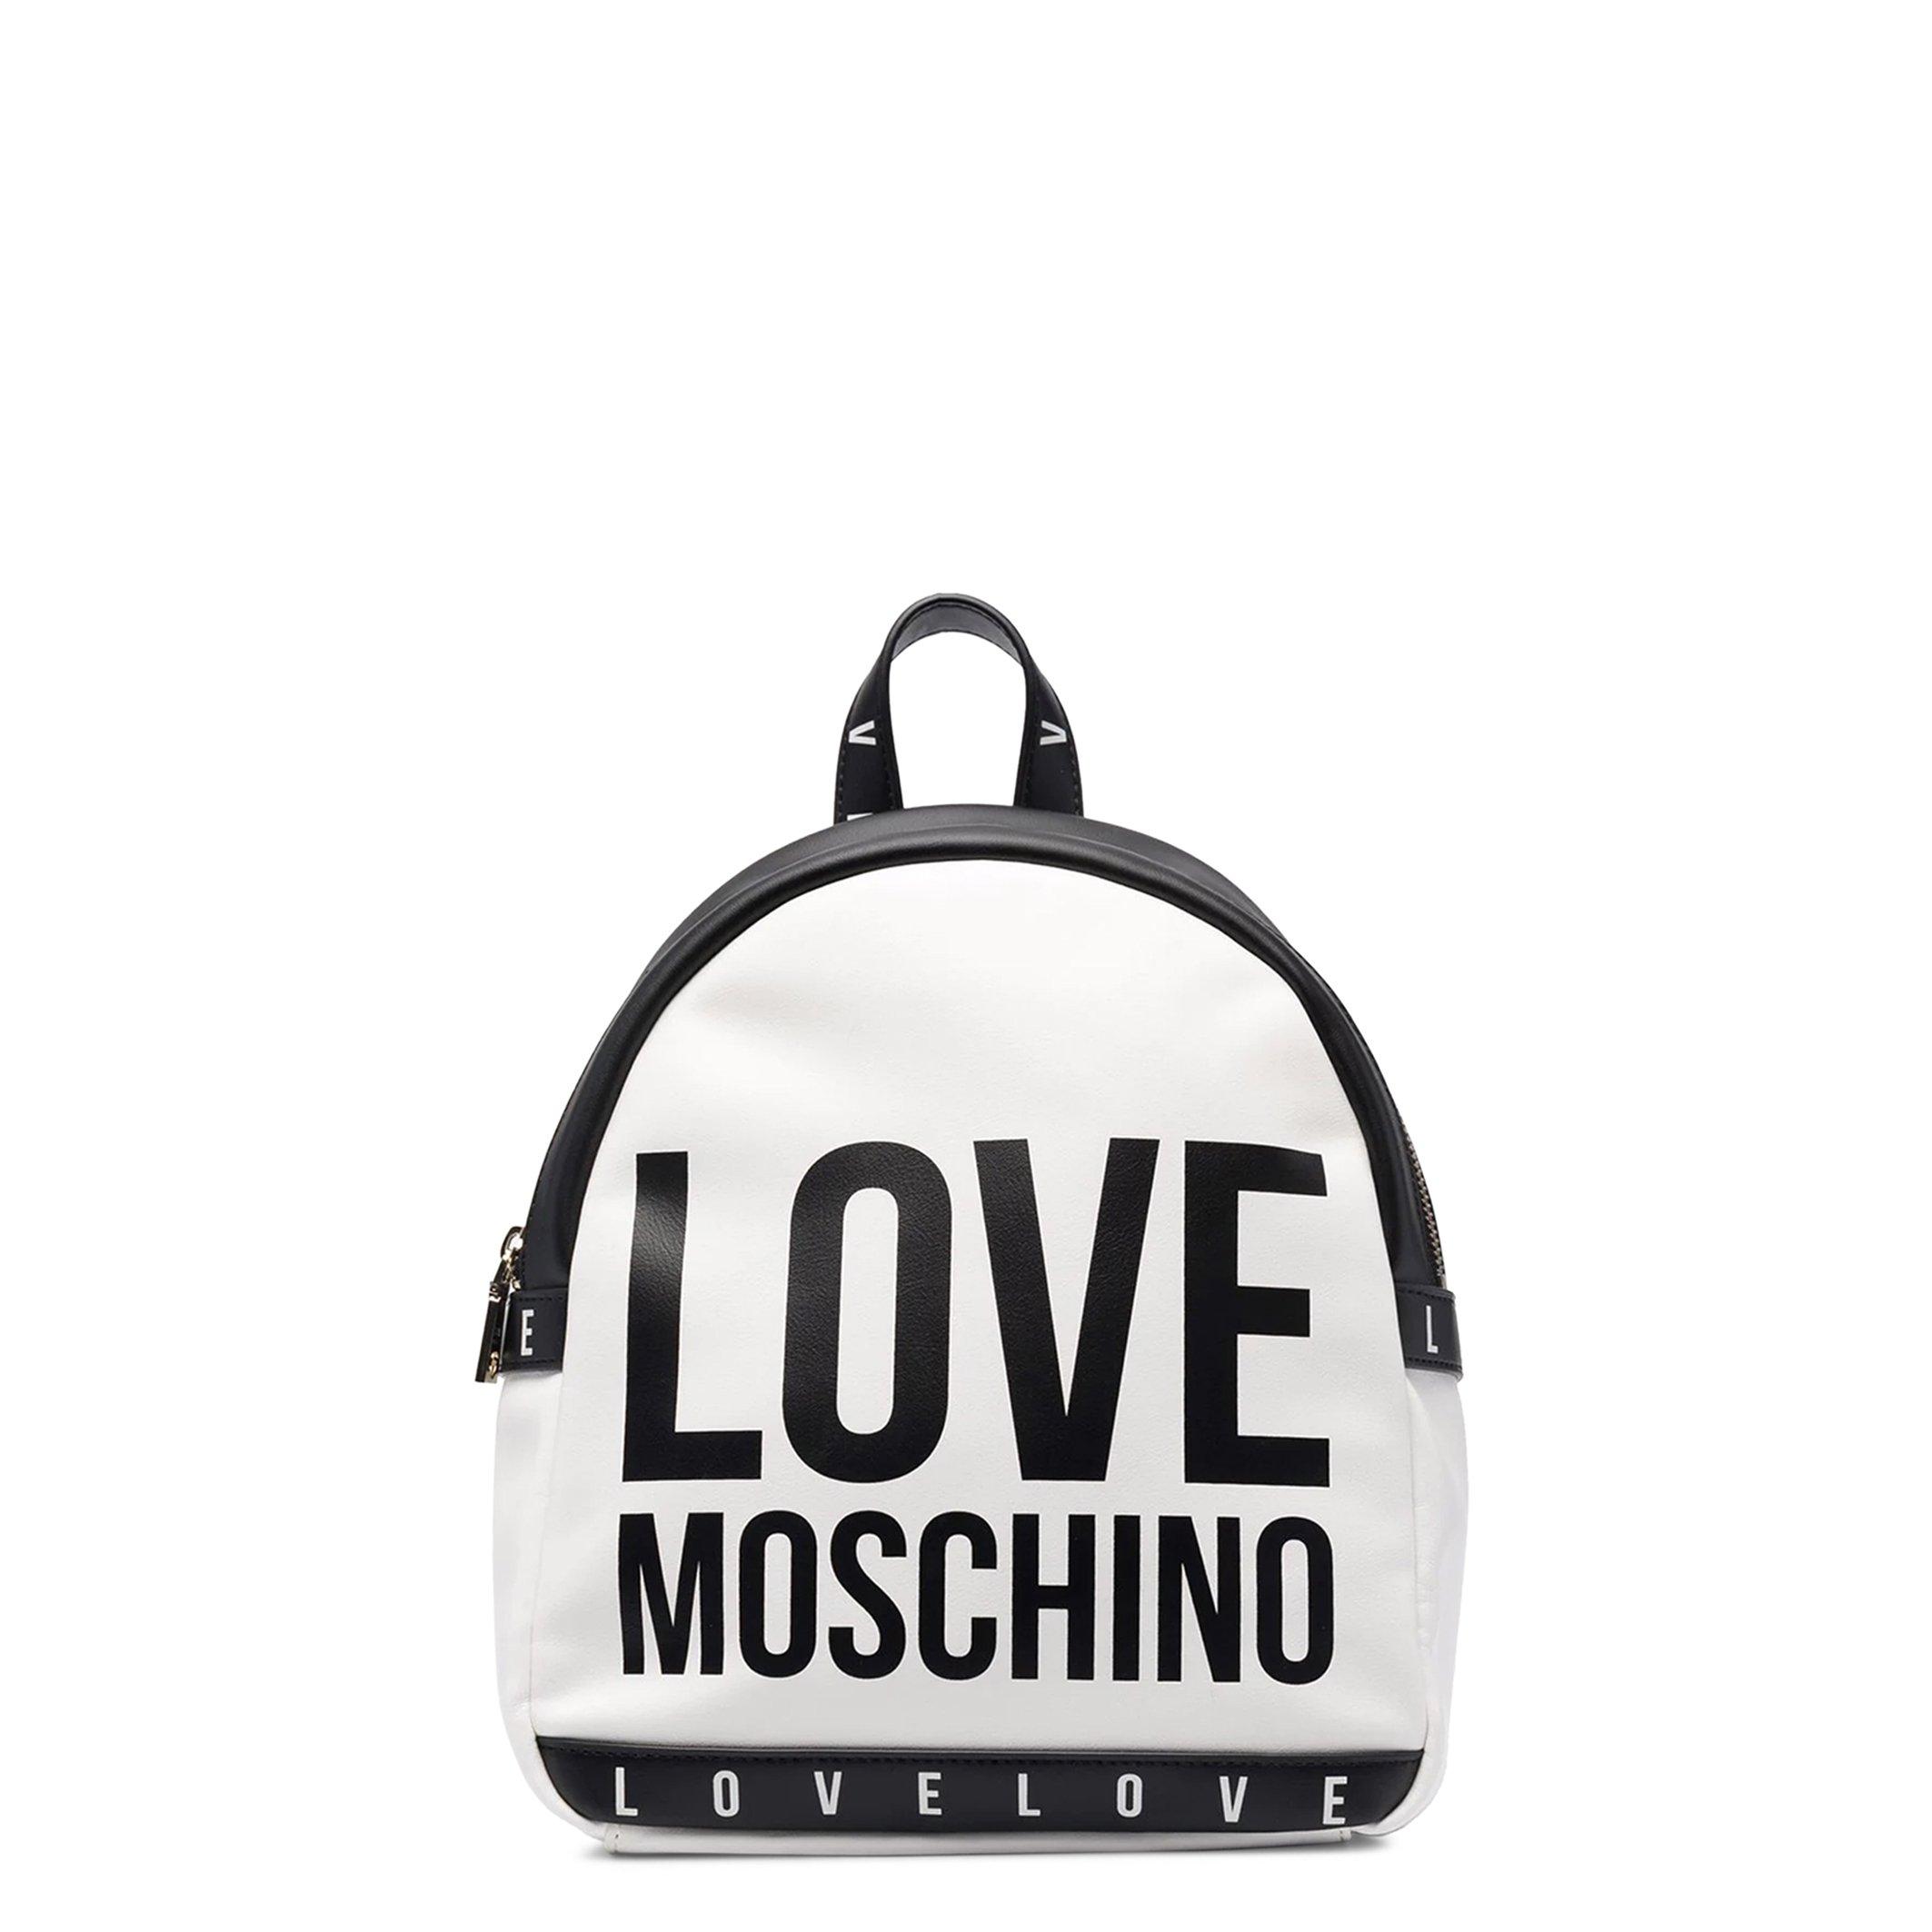 Love Moschino Women's Backpack Various Colours JC4183PP1DLI0 - white NOSIZE